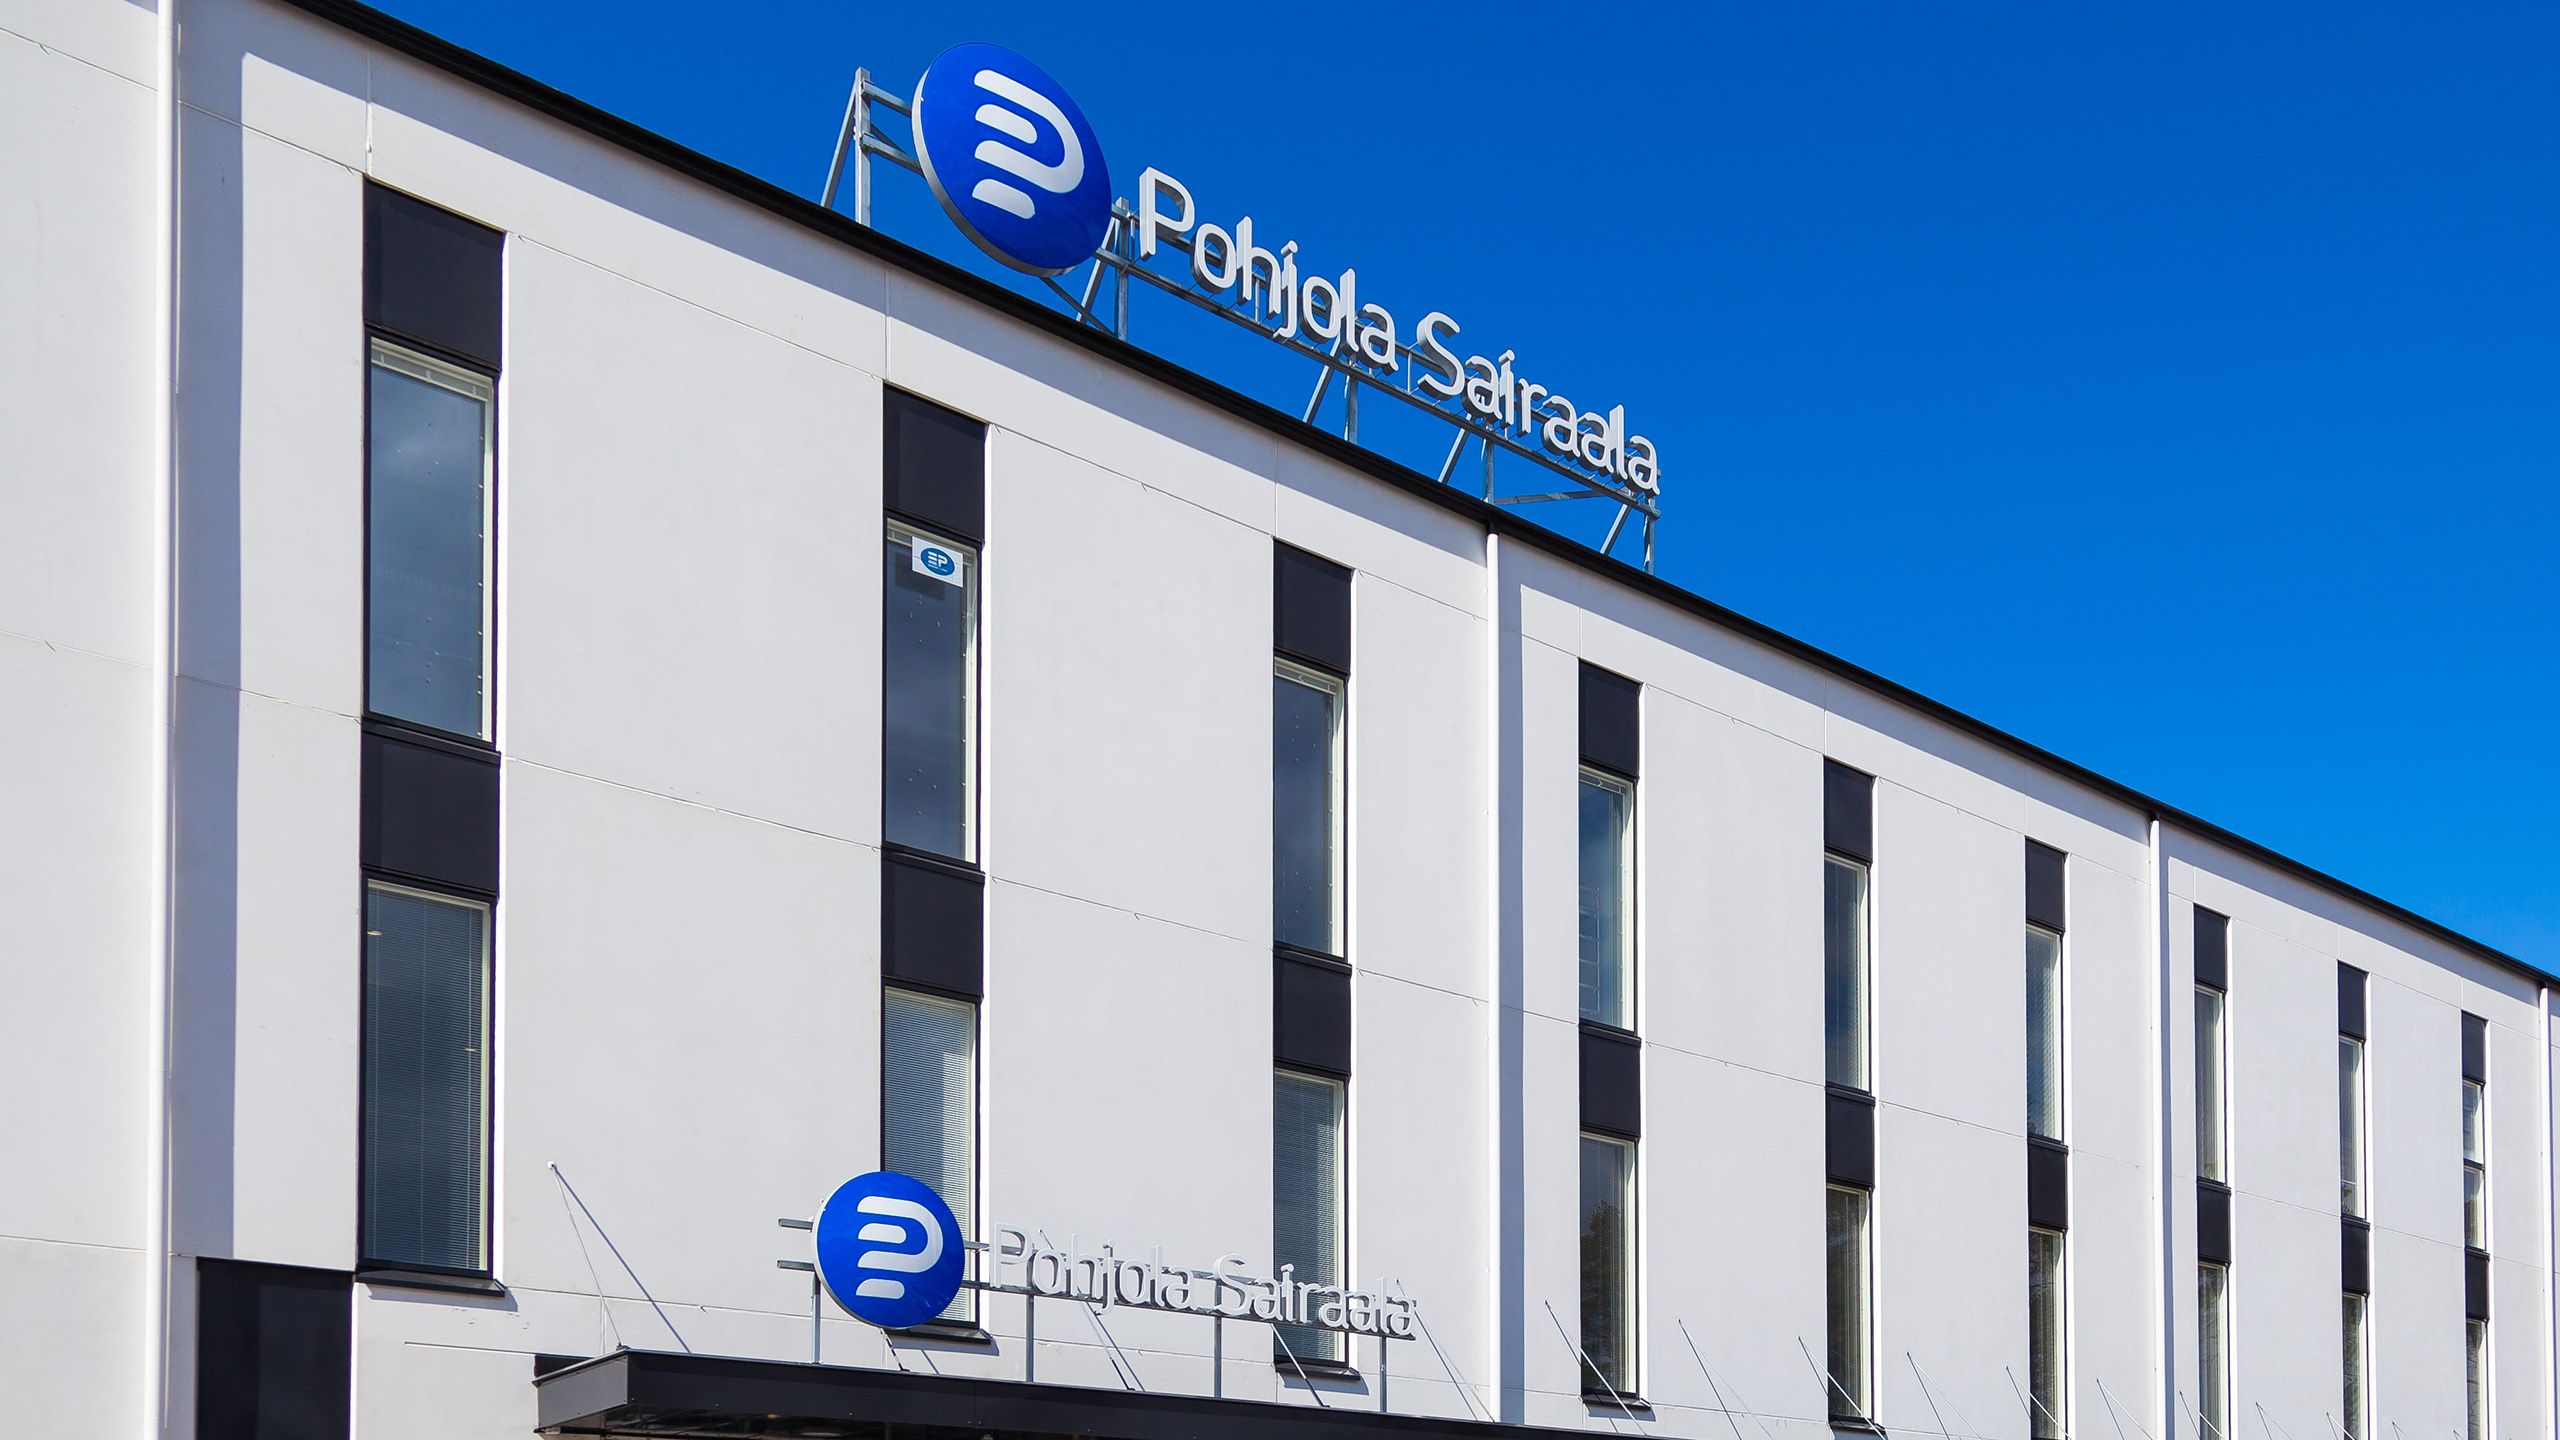 Op Pohjola Sairaala Tampere